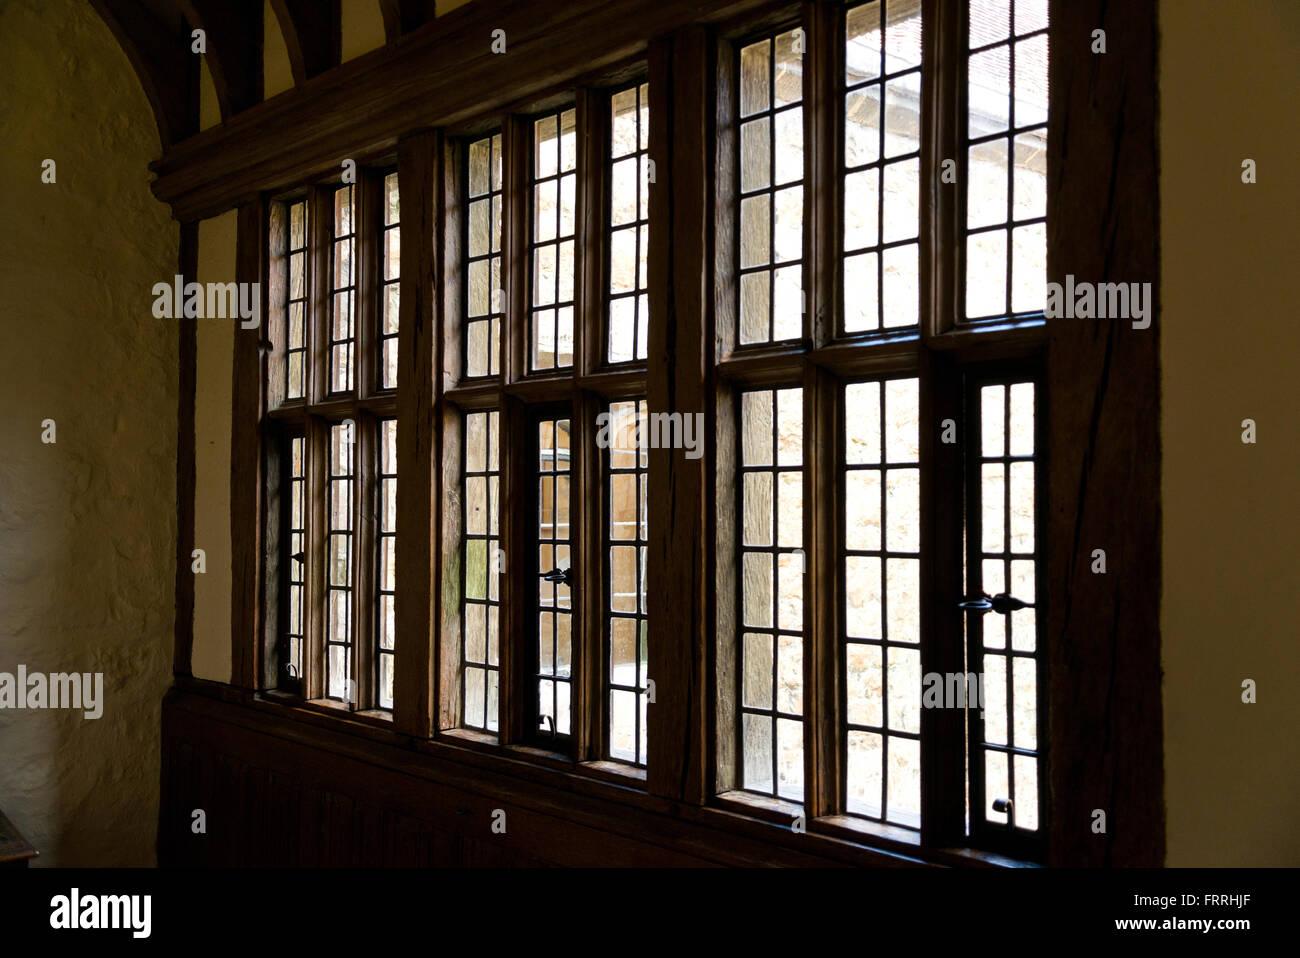 Old building details. Windows,  interior. - Stock Image